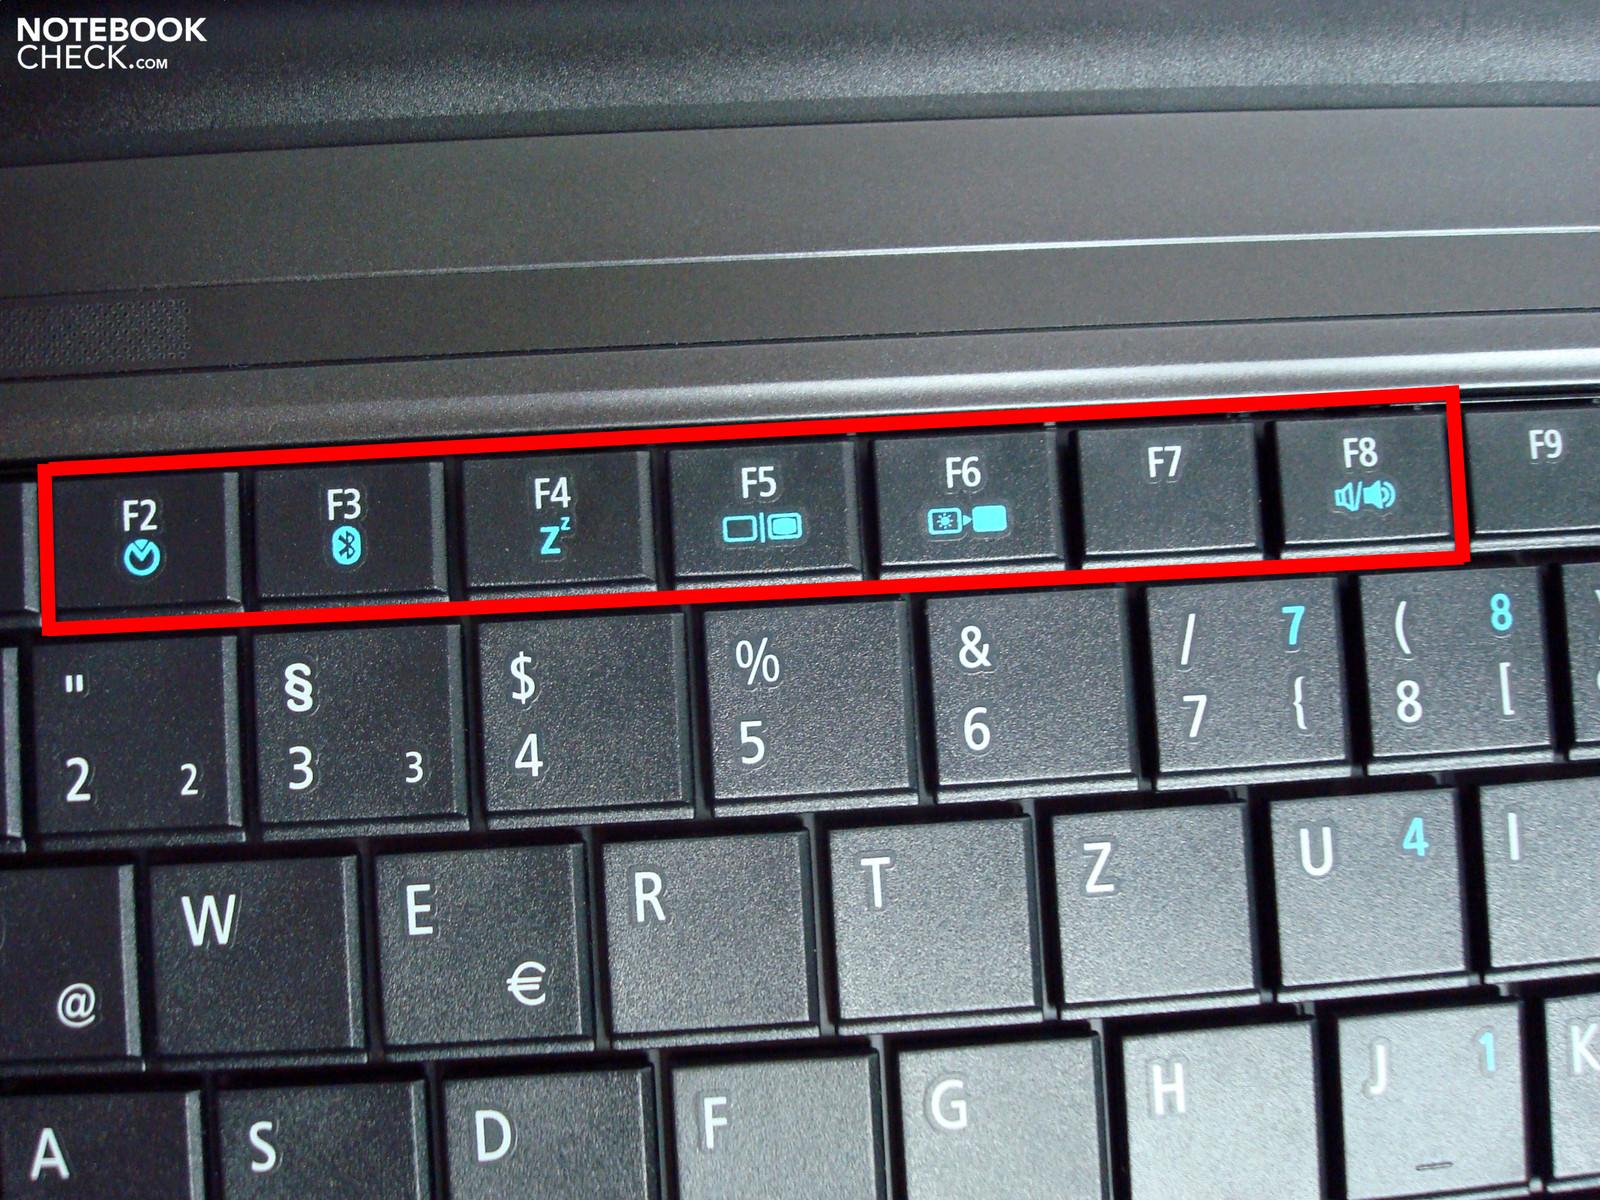 Notebook samsung desativar tecla fn - Todas As Fun Es Importantes Podem Ser Ativadas Atrav S Das Combina Es Fn